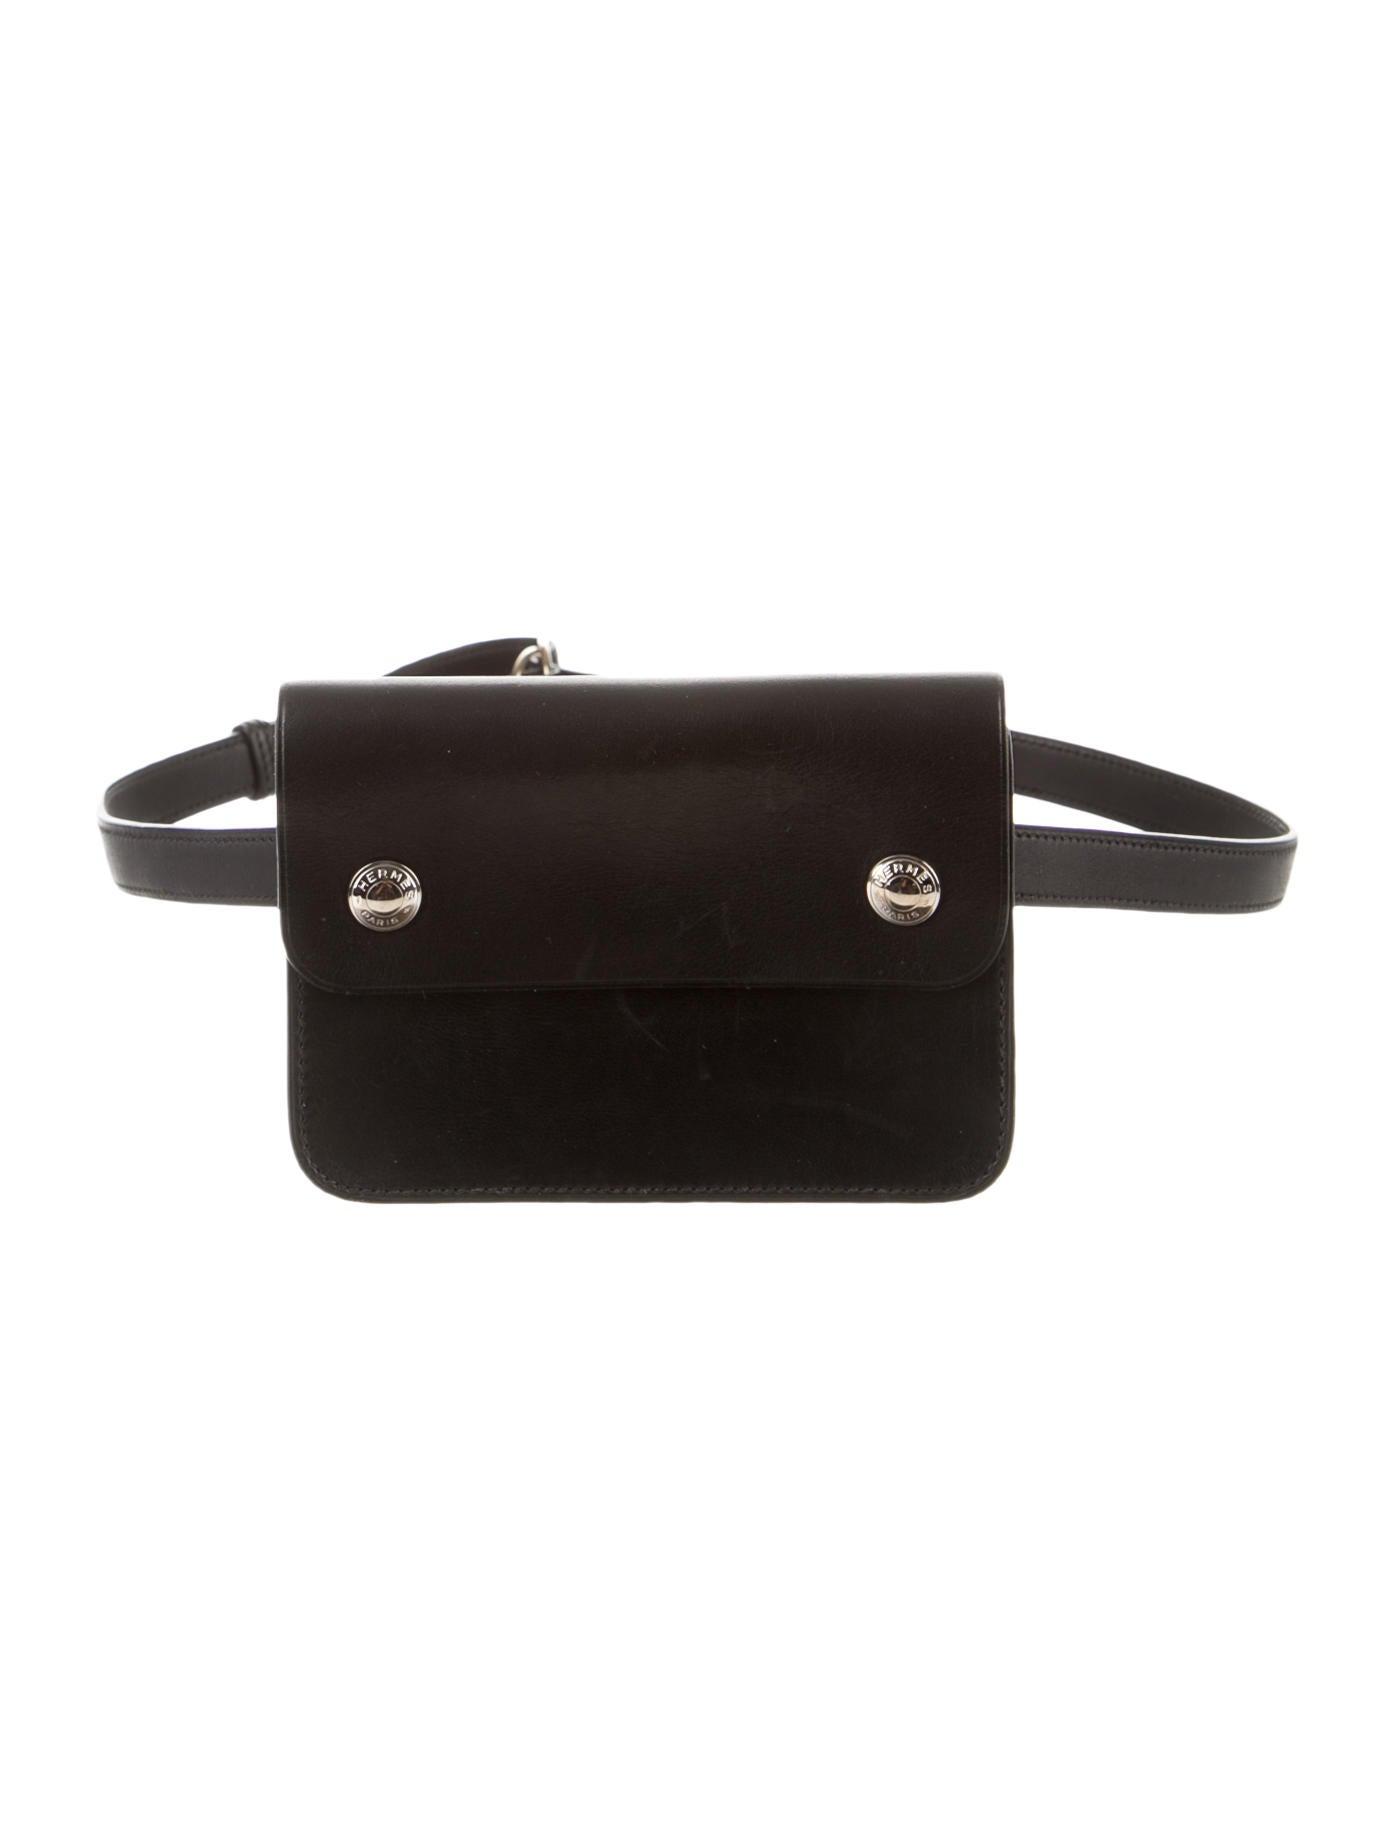 outlet bags usa fake - hermes victoria valise, fake birkins